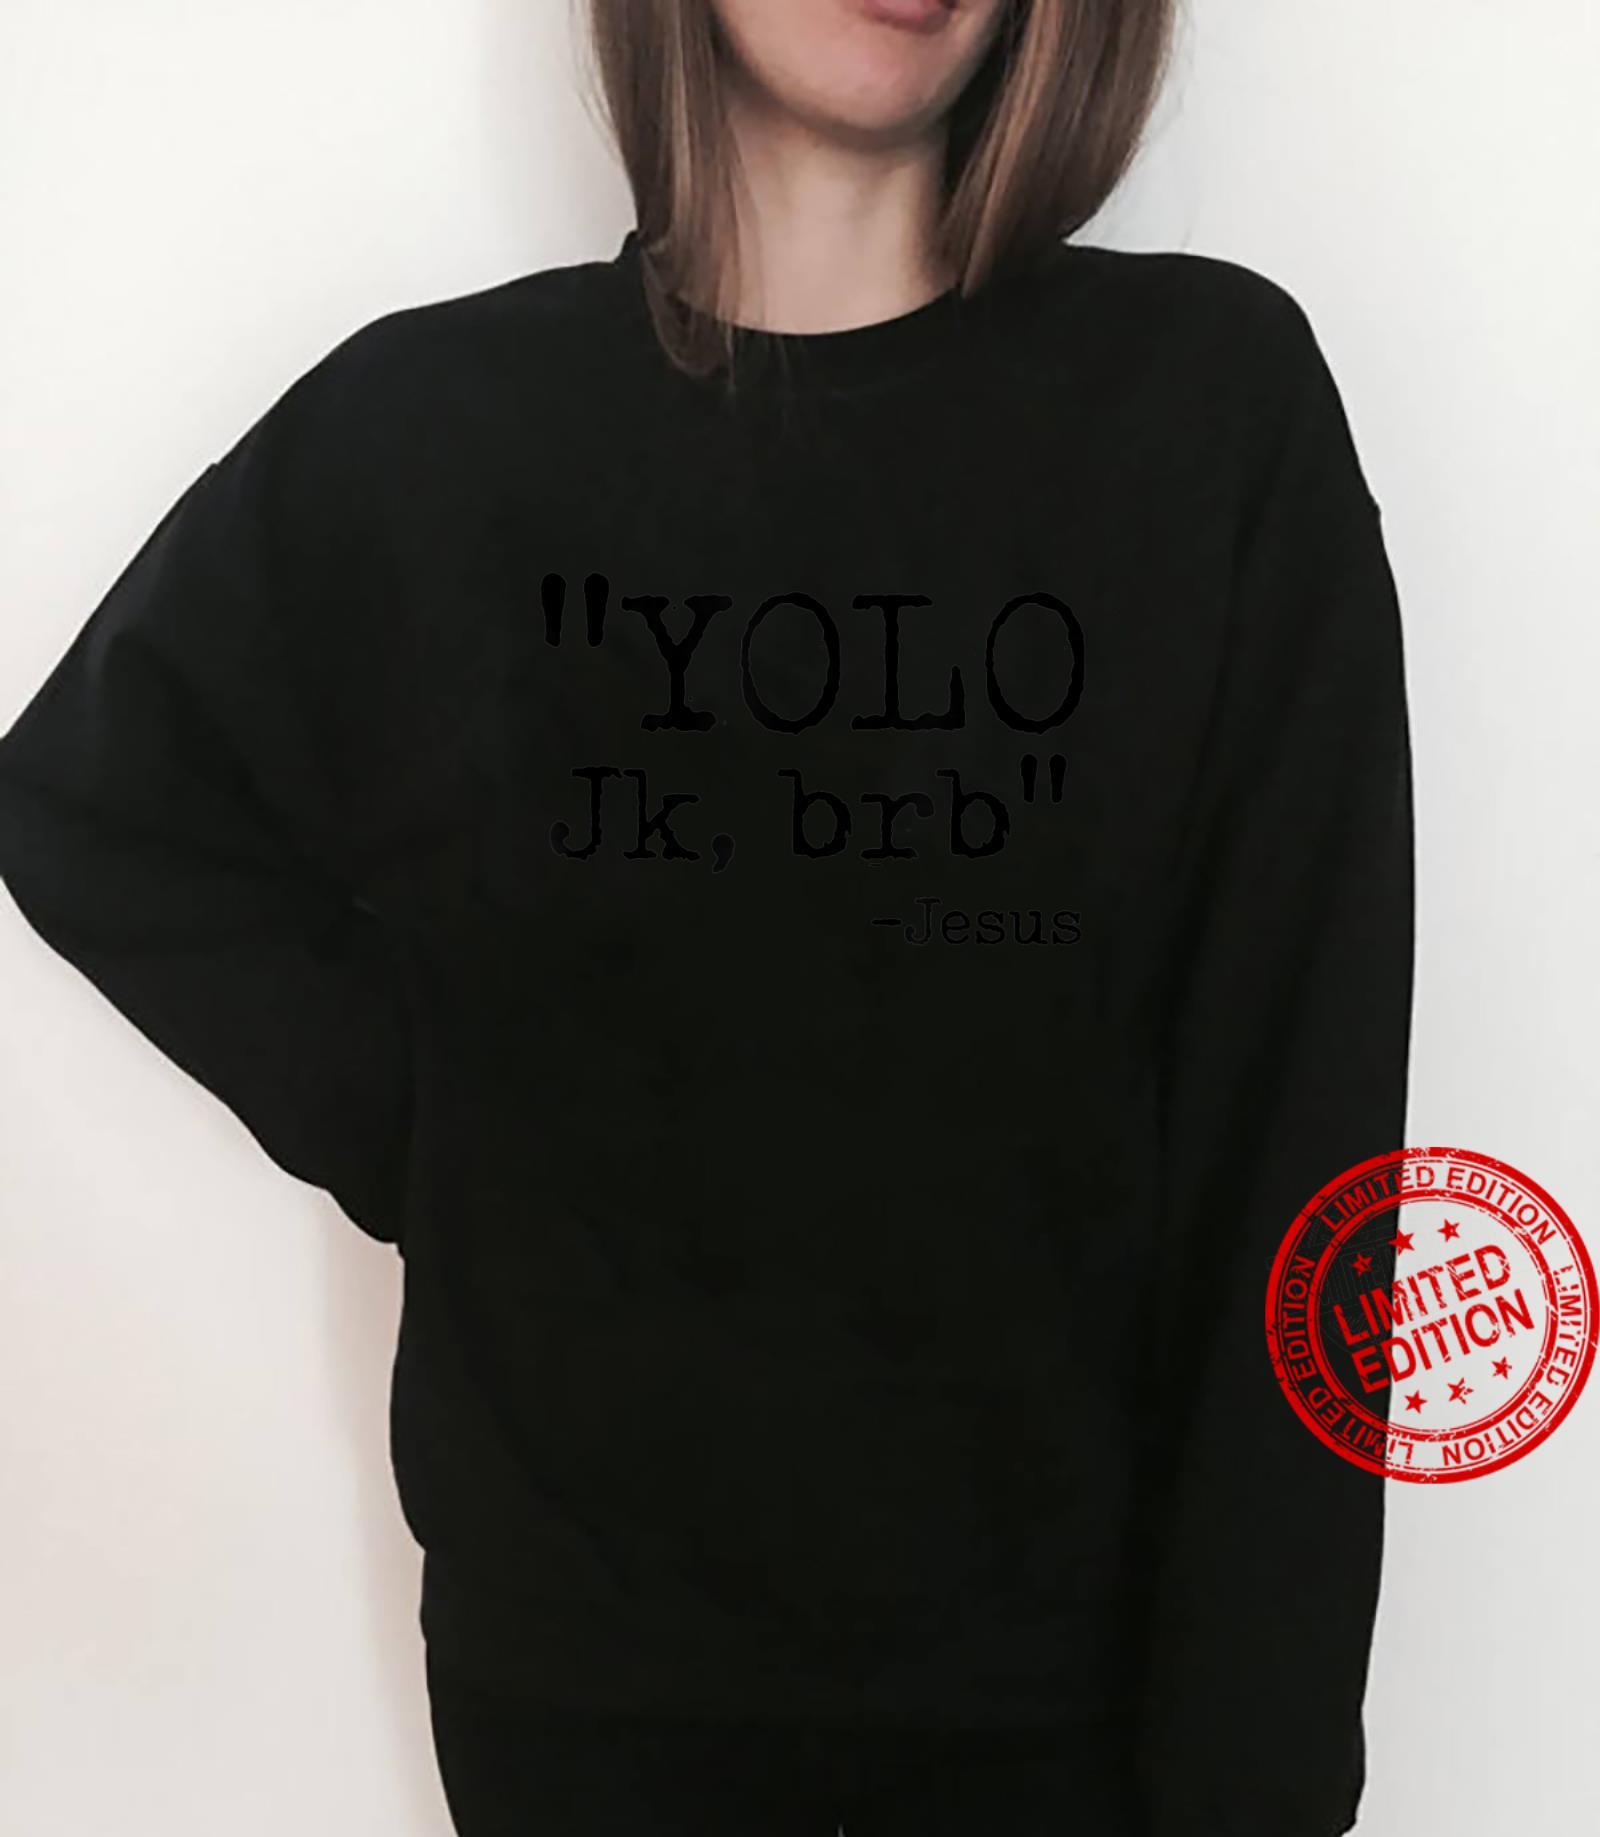 YOLO Jk BRB Jesus Christian Bible Verse Quotes Shirt sweater